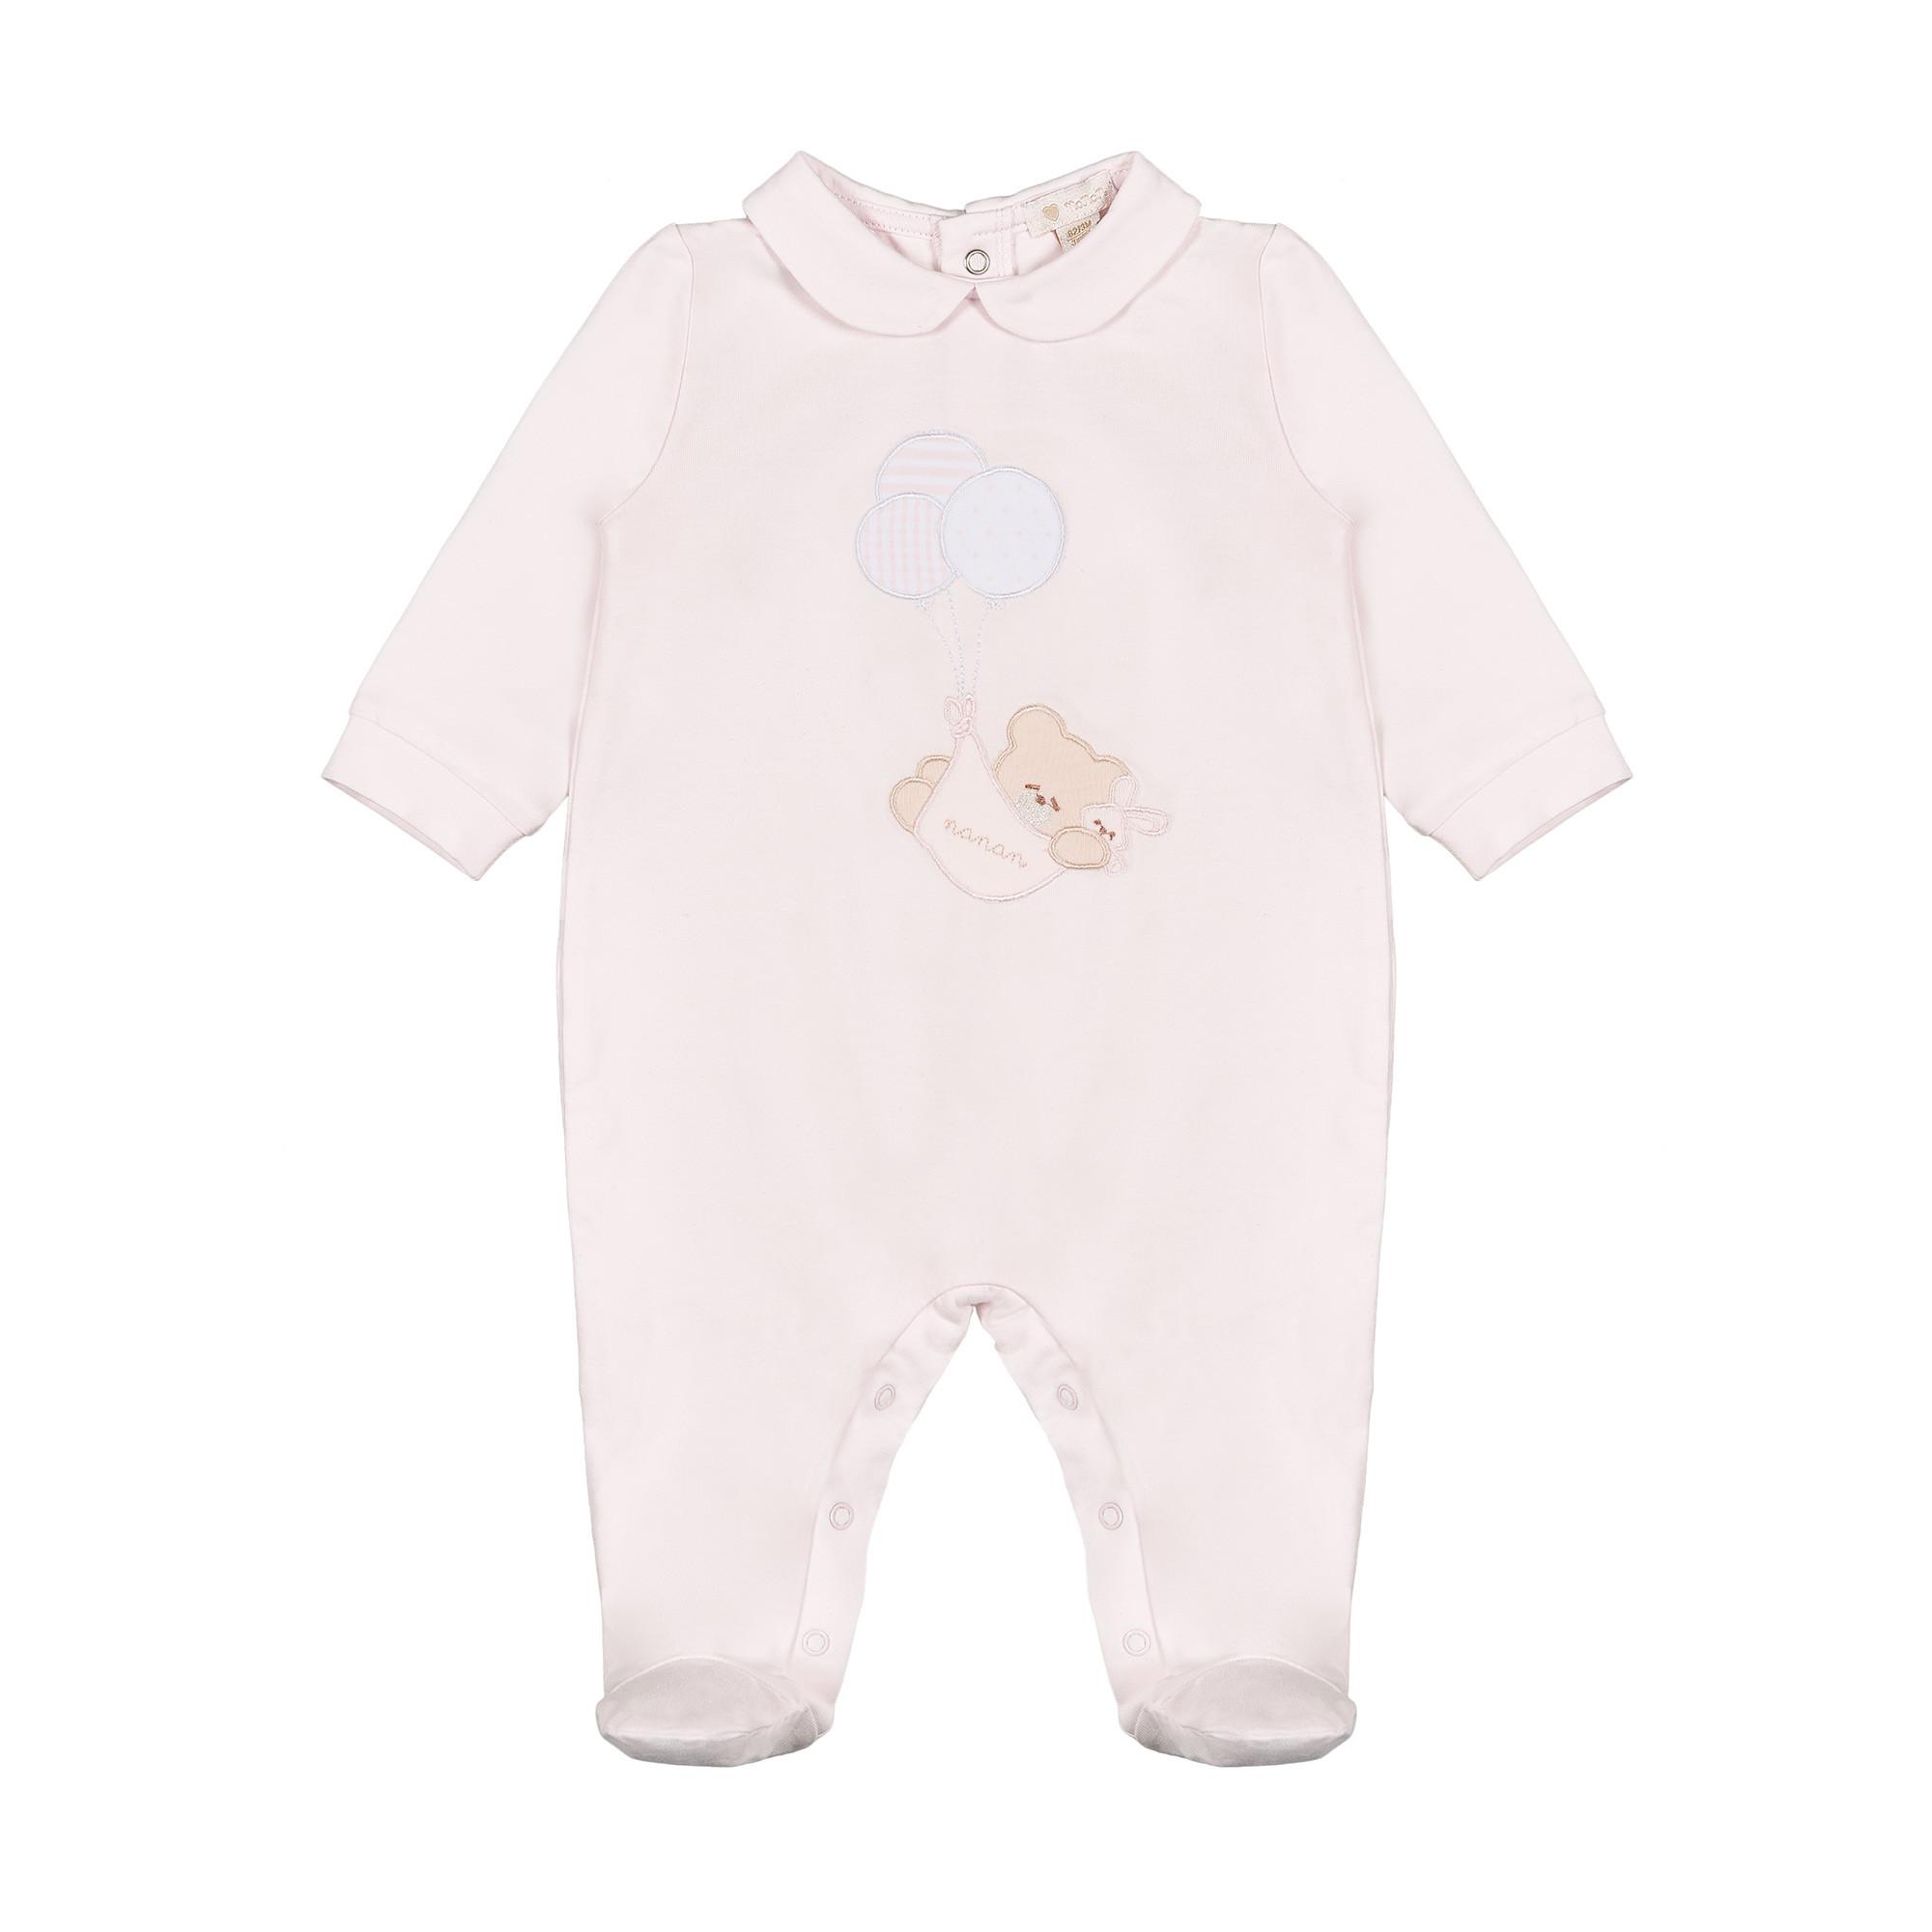 Pelele rosa con osito de peluche y globos Nanan - 6 meses